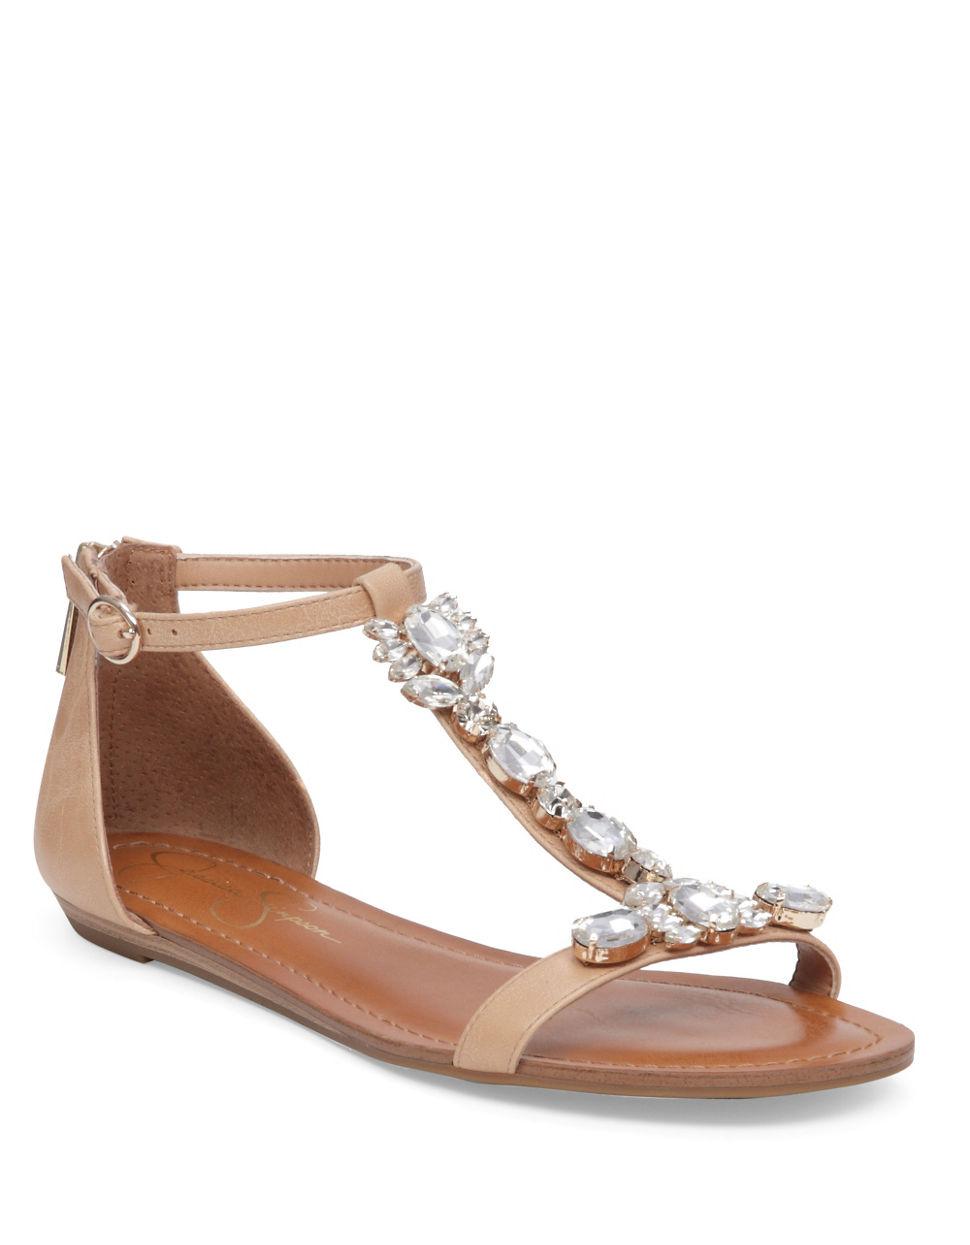 Jessica simpson Lanning Glass Stone Embellished Slingback ...